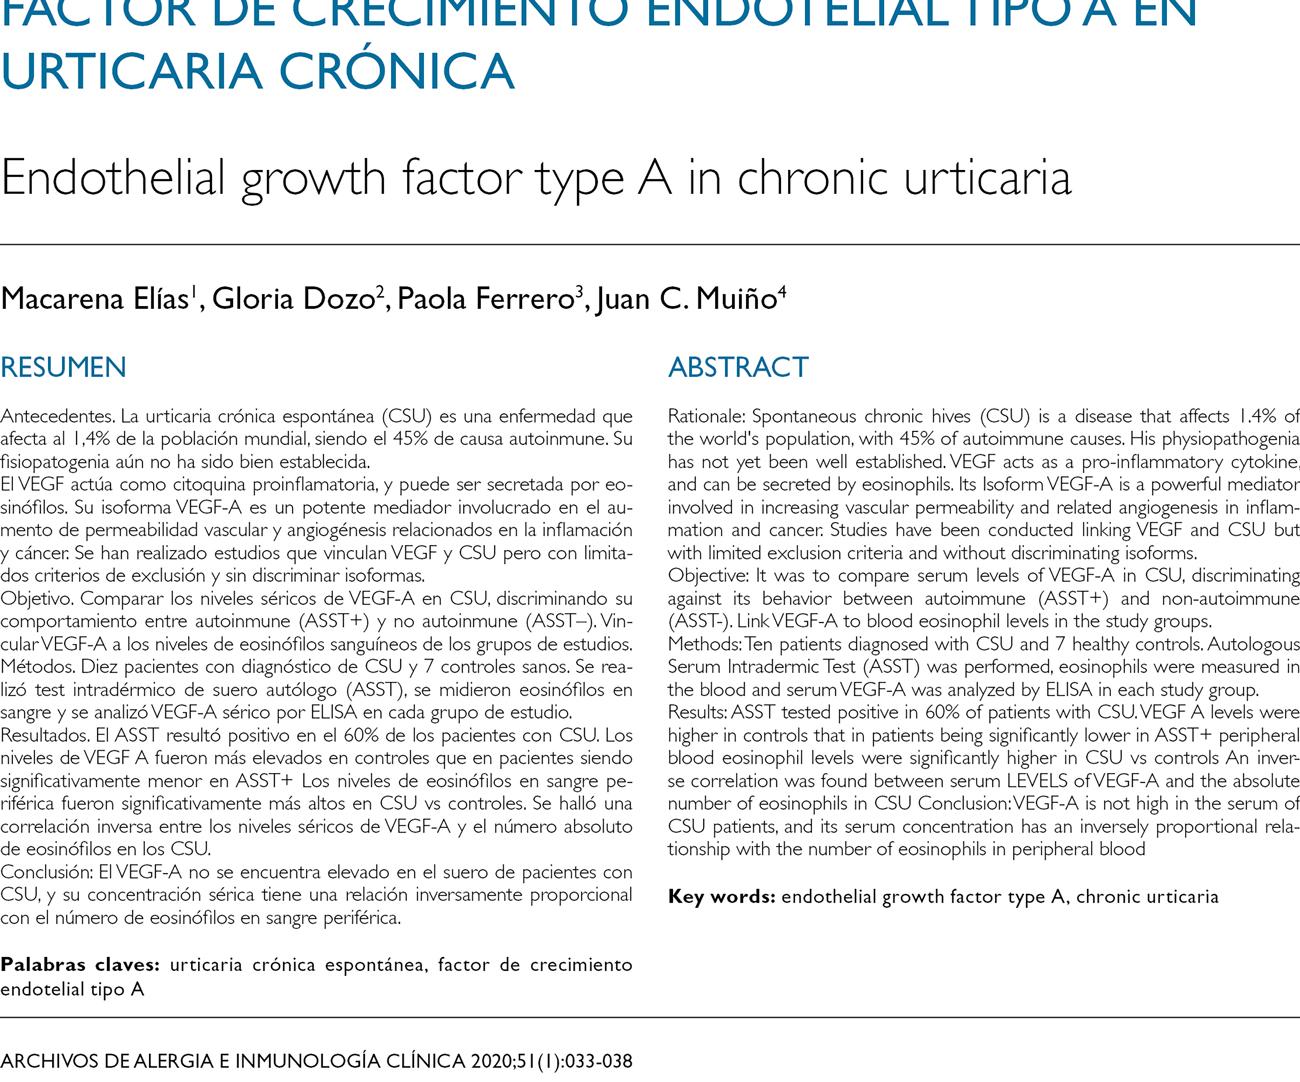 Factor de crecimiento endotelial tipo A en urticaria crónica